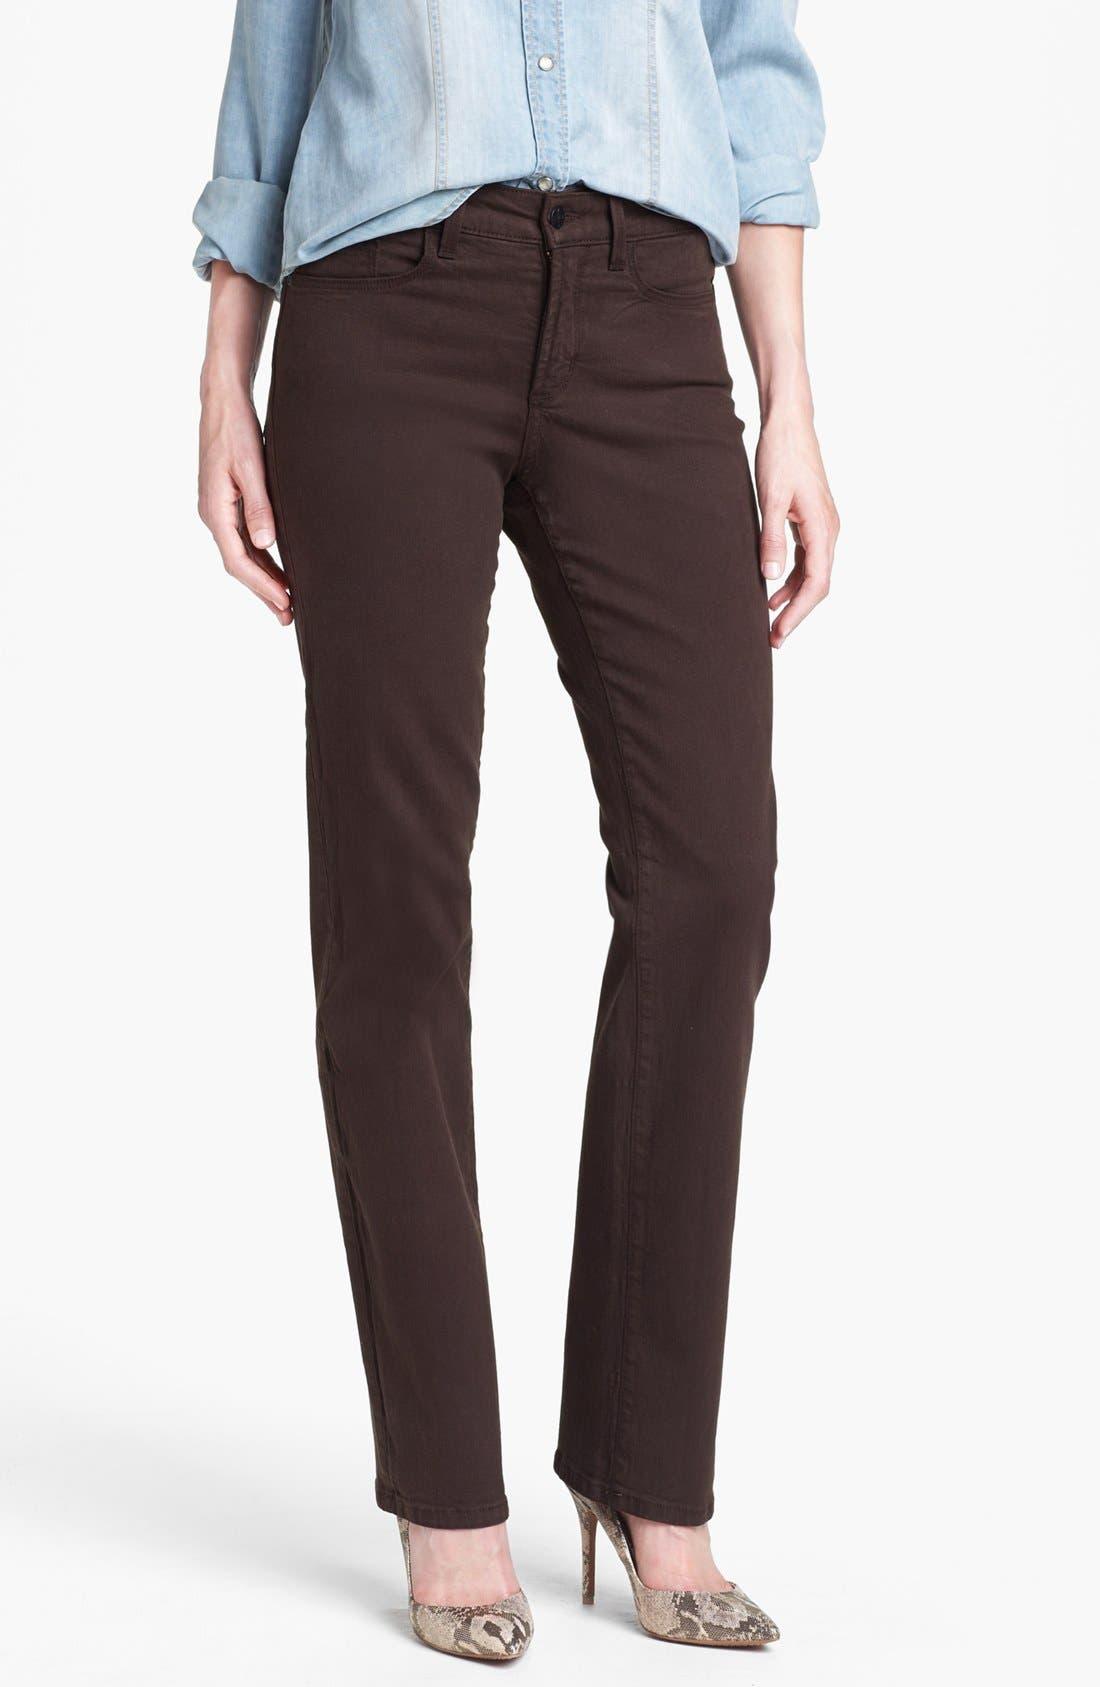 Main Image - NYDJ 'Marilyn' Embellished Pocket Stretch Straight Leg Jeans (Ganache) (Regular & Petite)